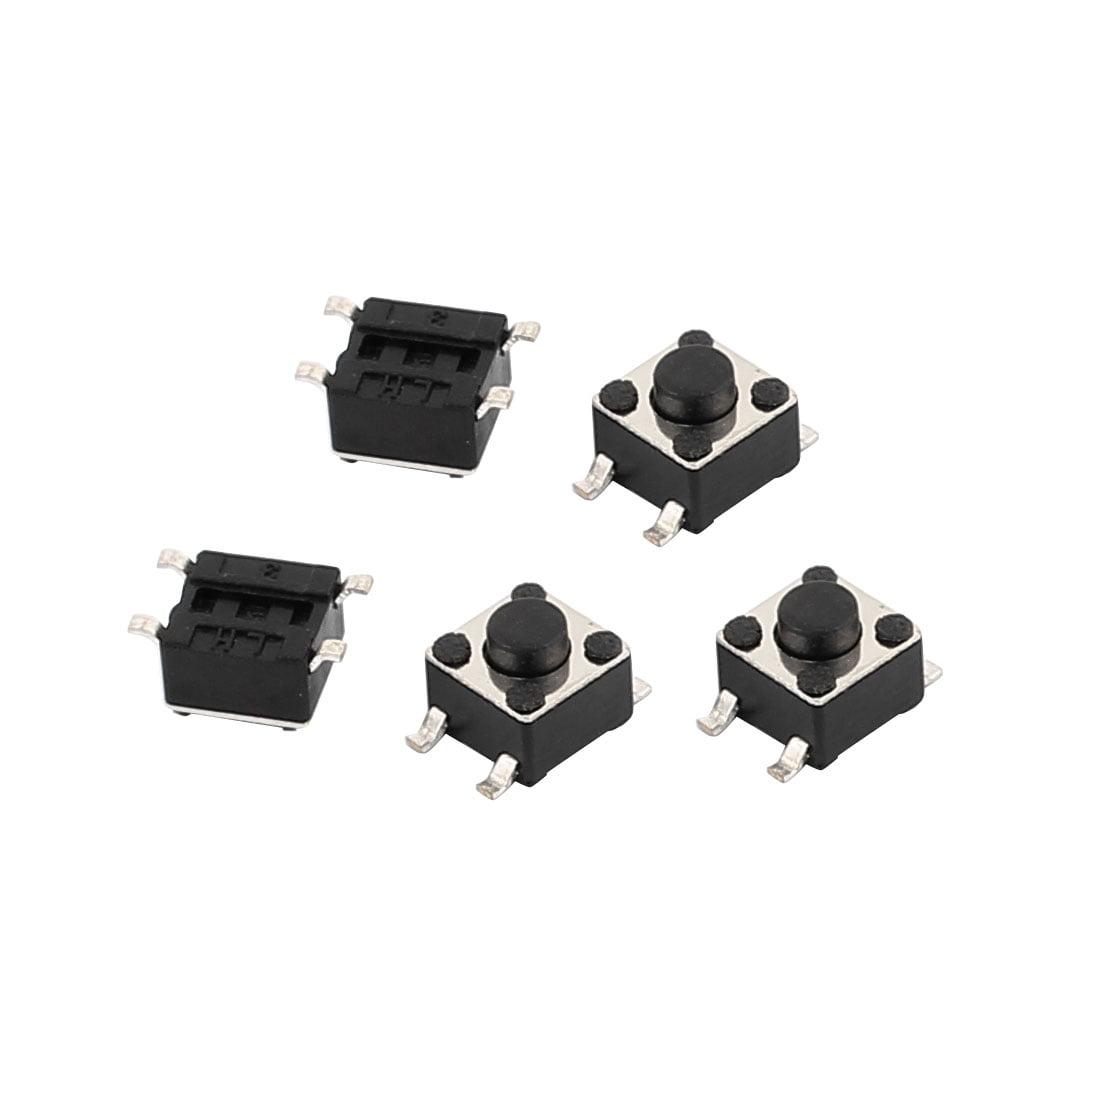 5Pcs 4 P Square 4.5mmx4.5mmx3.8mm Momentary Mini Push Button Switch - image 1 of 1